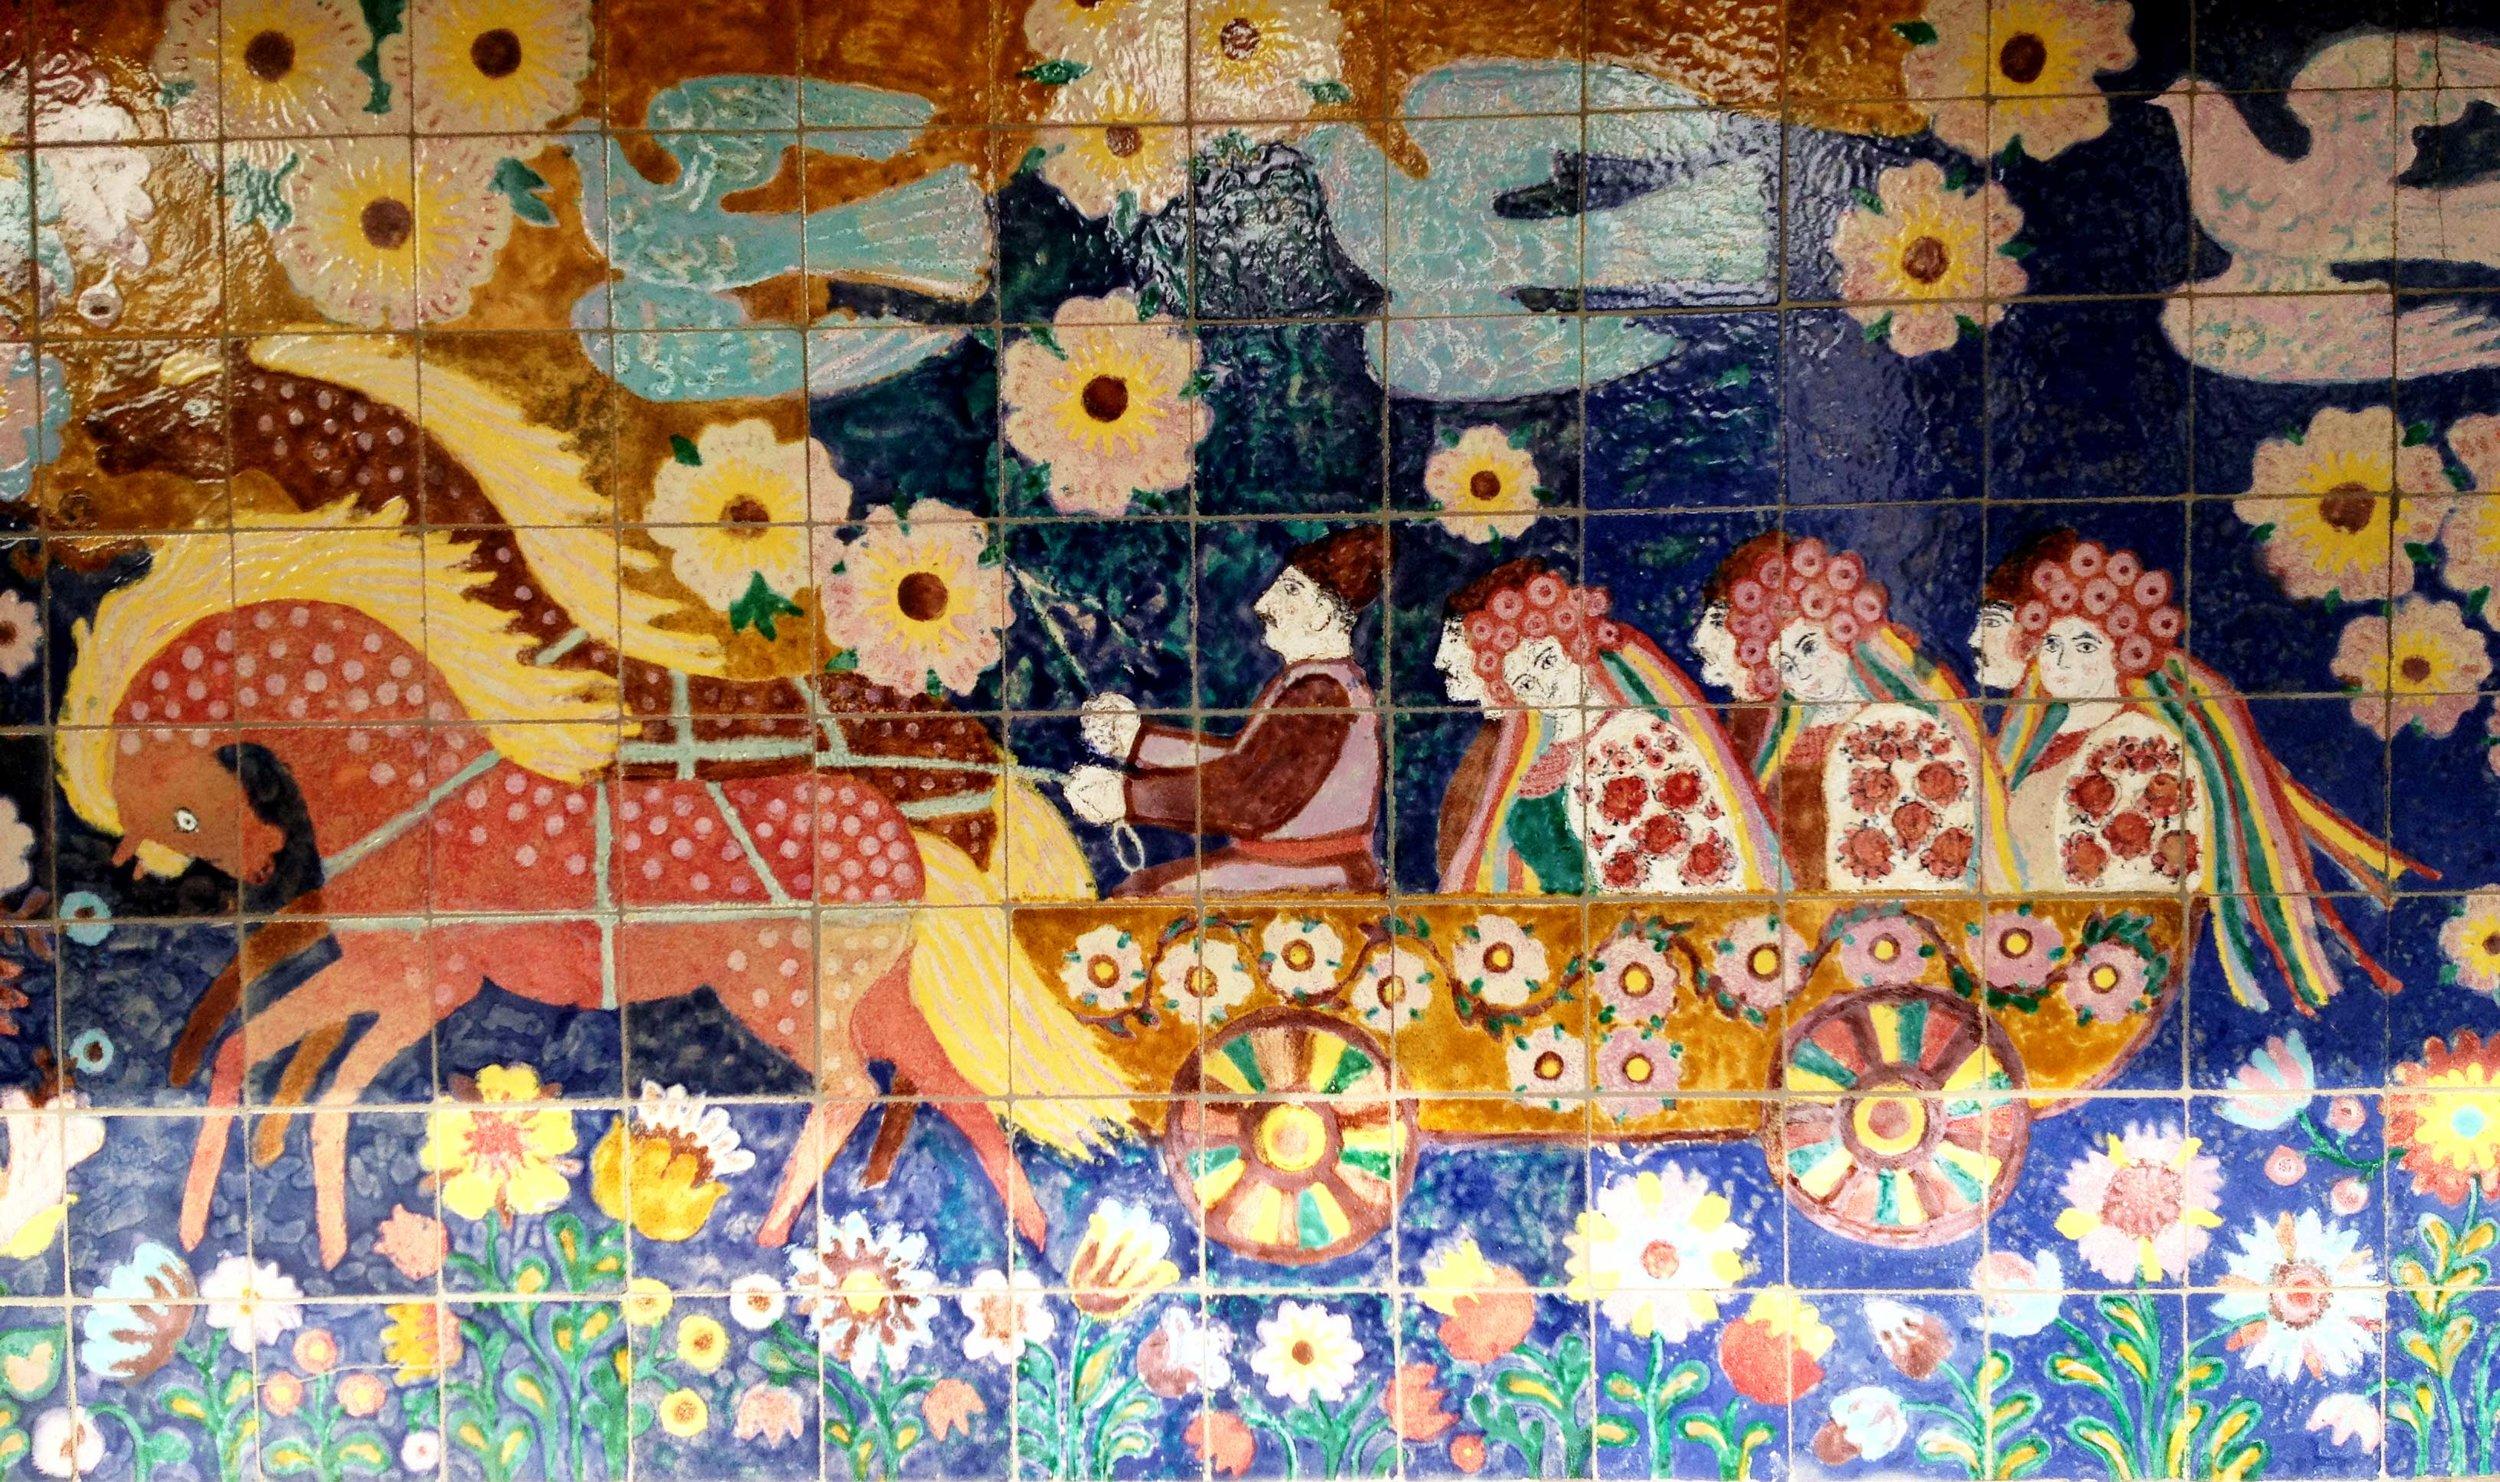 Ukrainian folk art covers the walls of the building Virsky's studio is in.